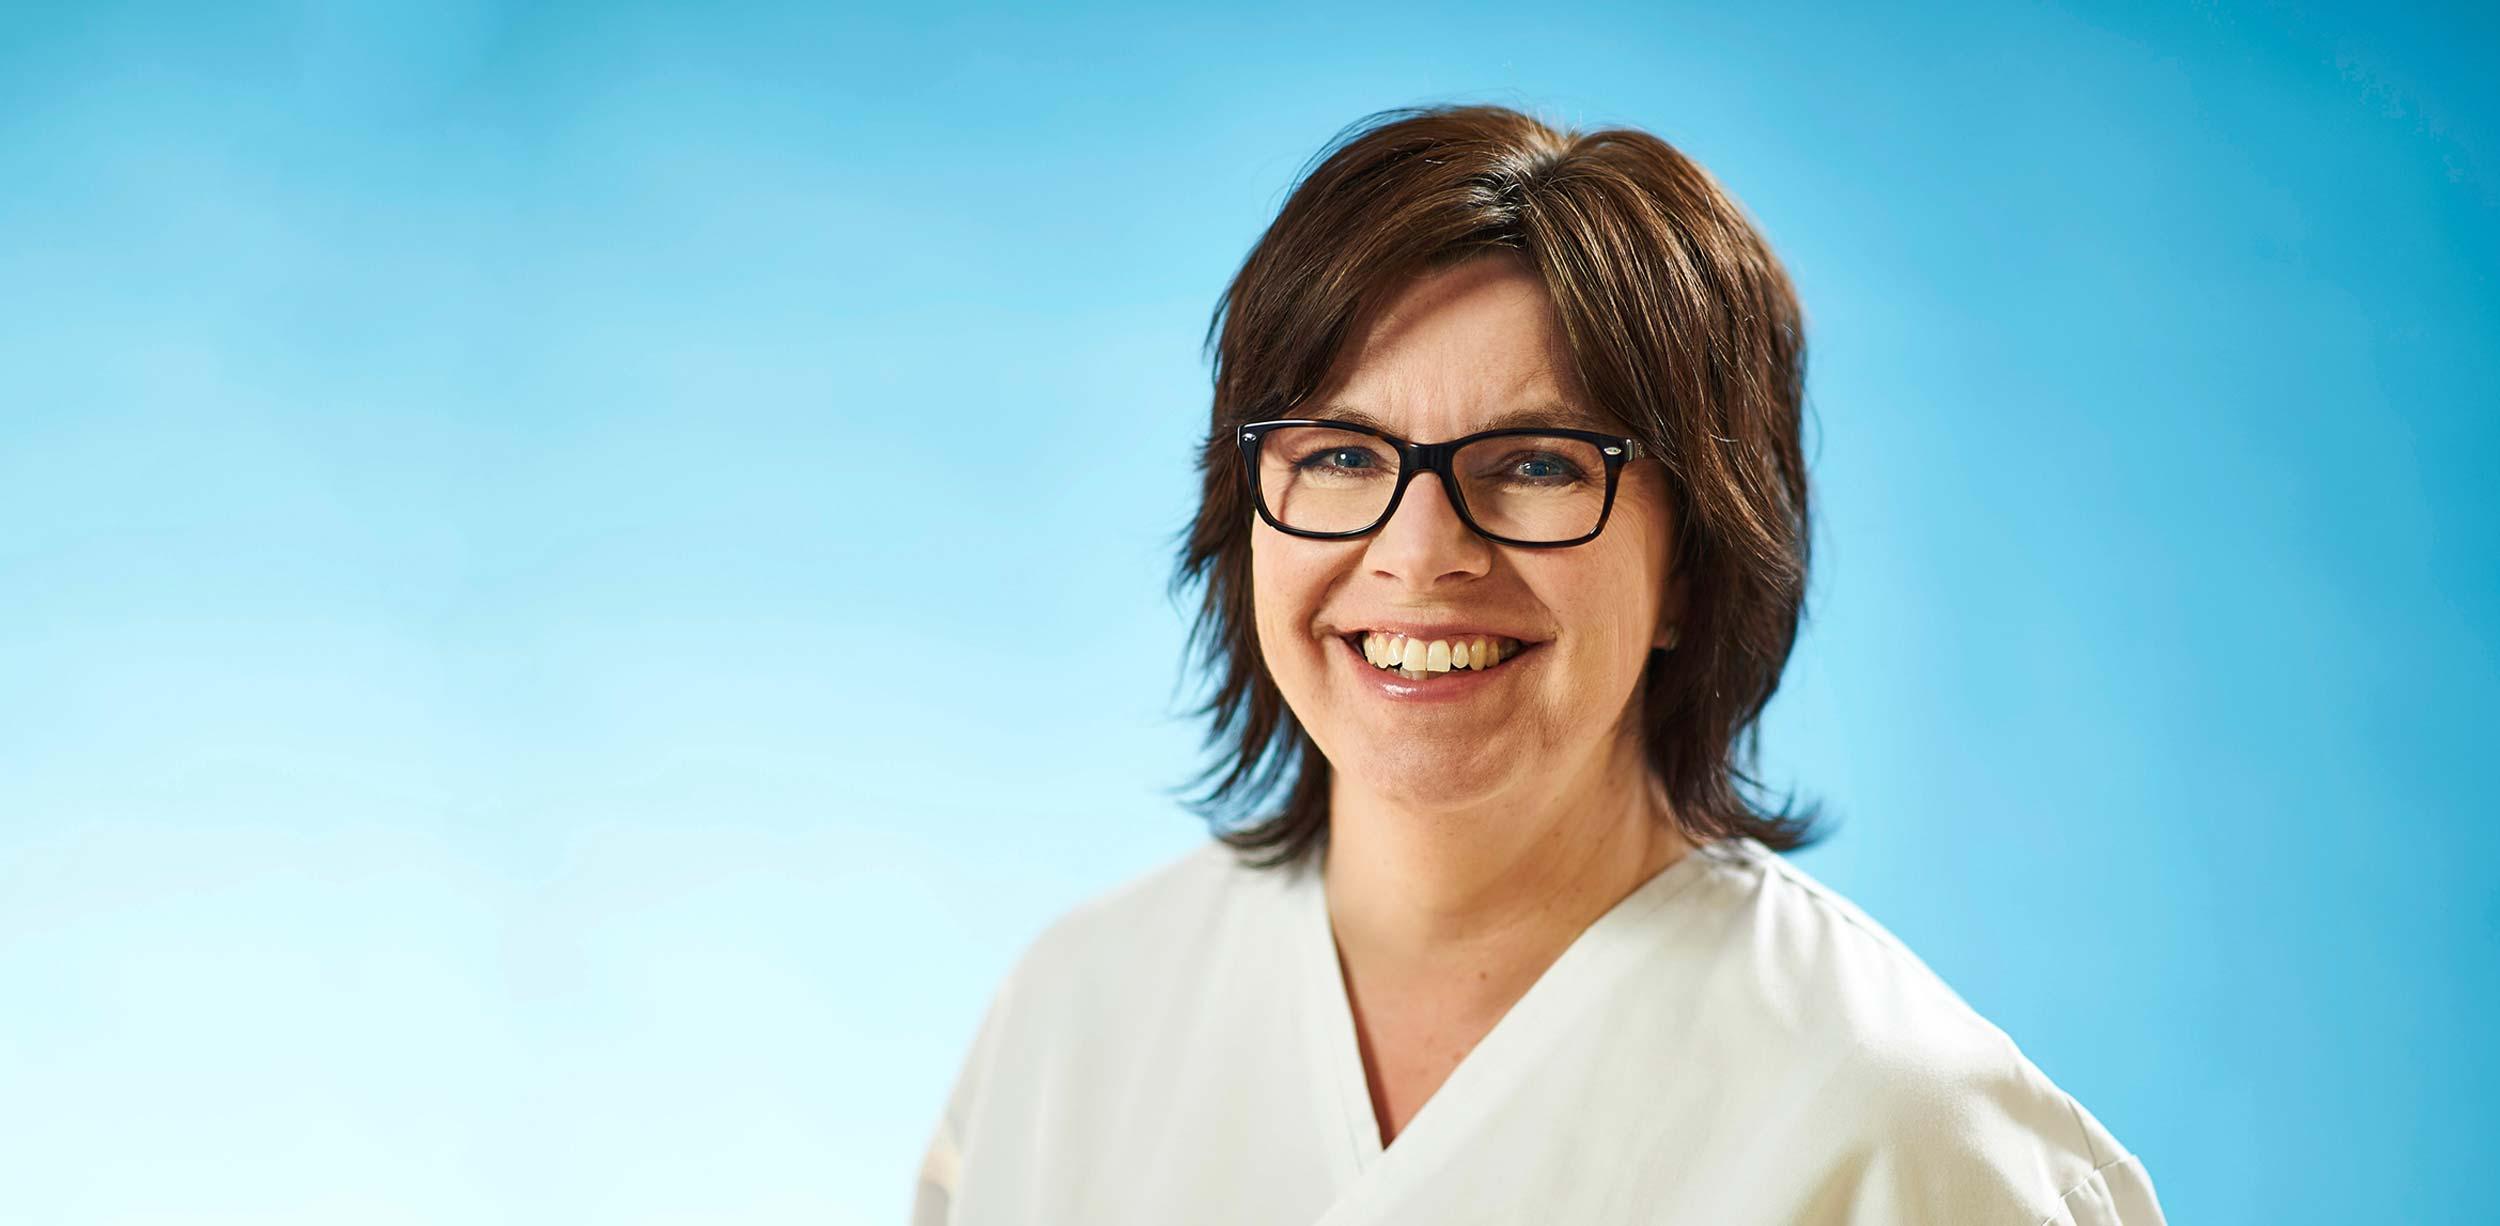 Andrea Köhler Breast Nurse